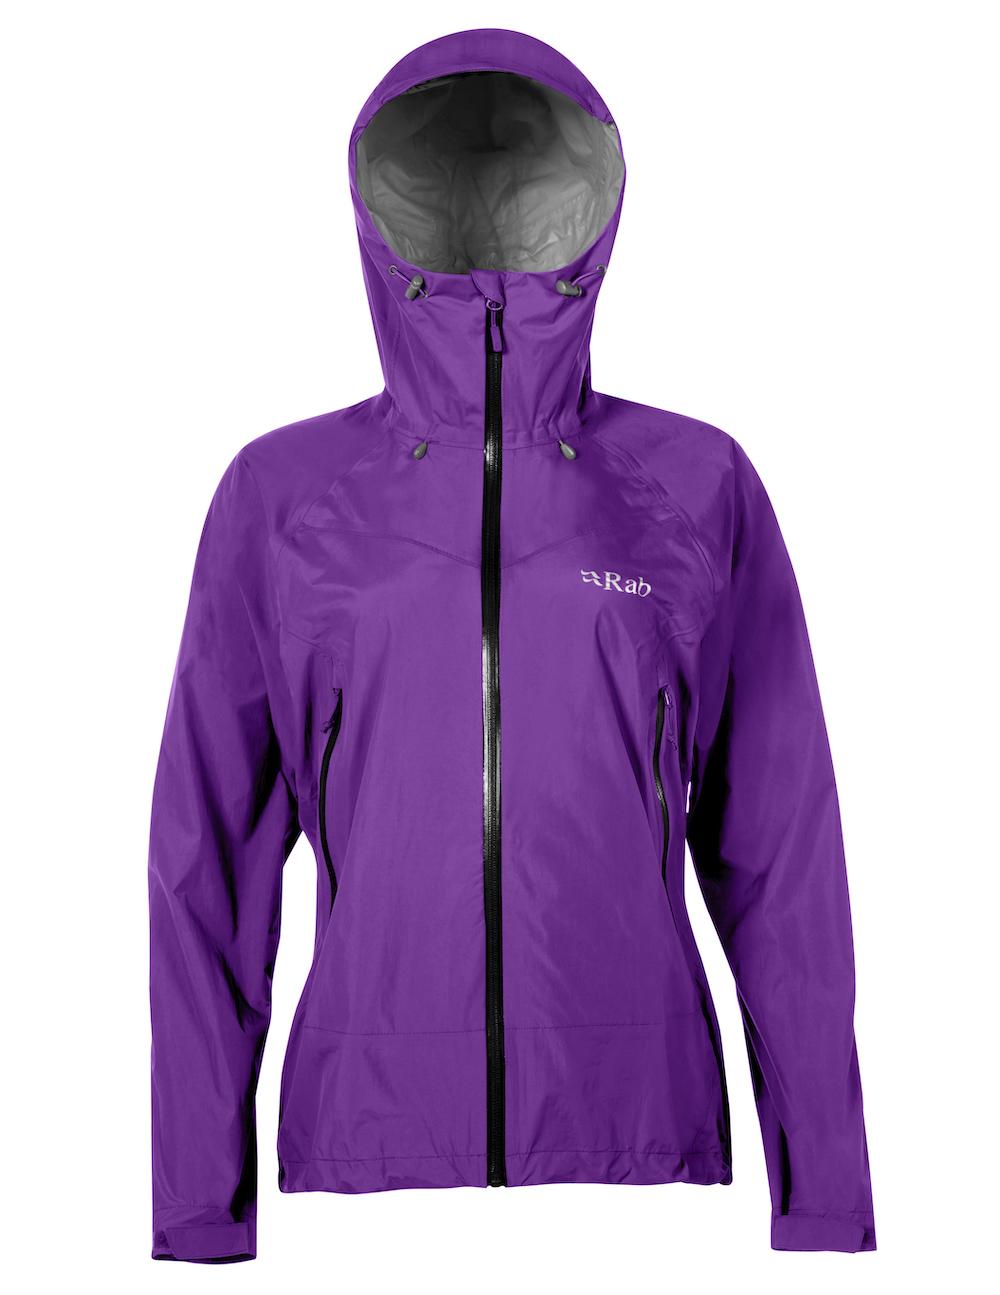 Rab Downpour Plus Jacket - Hardshell jacket - Women's